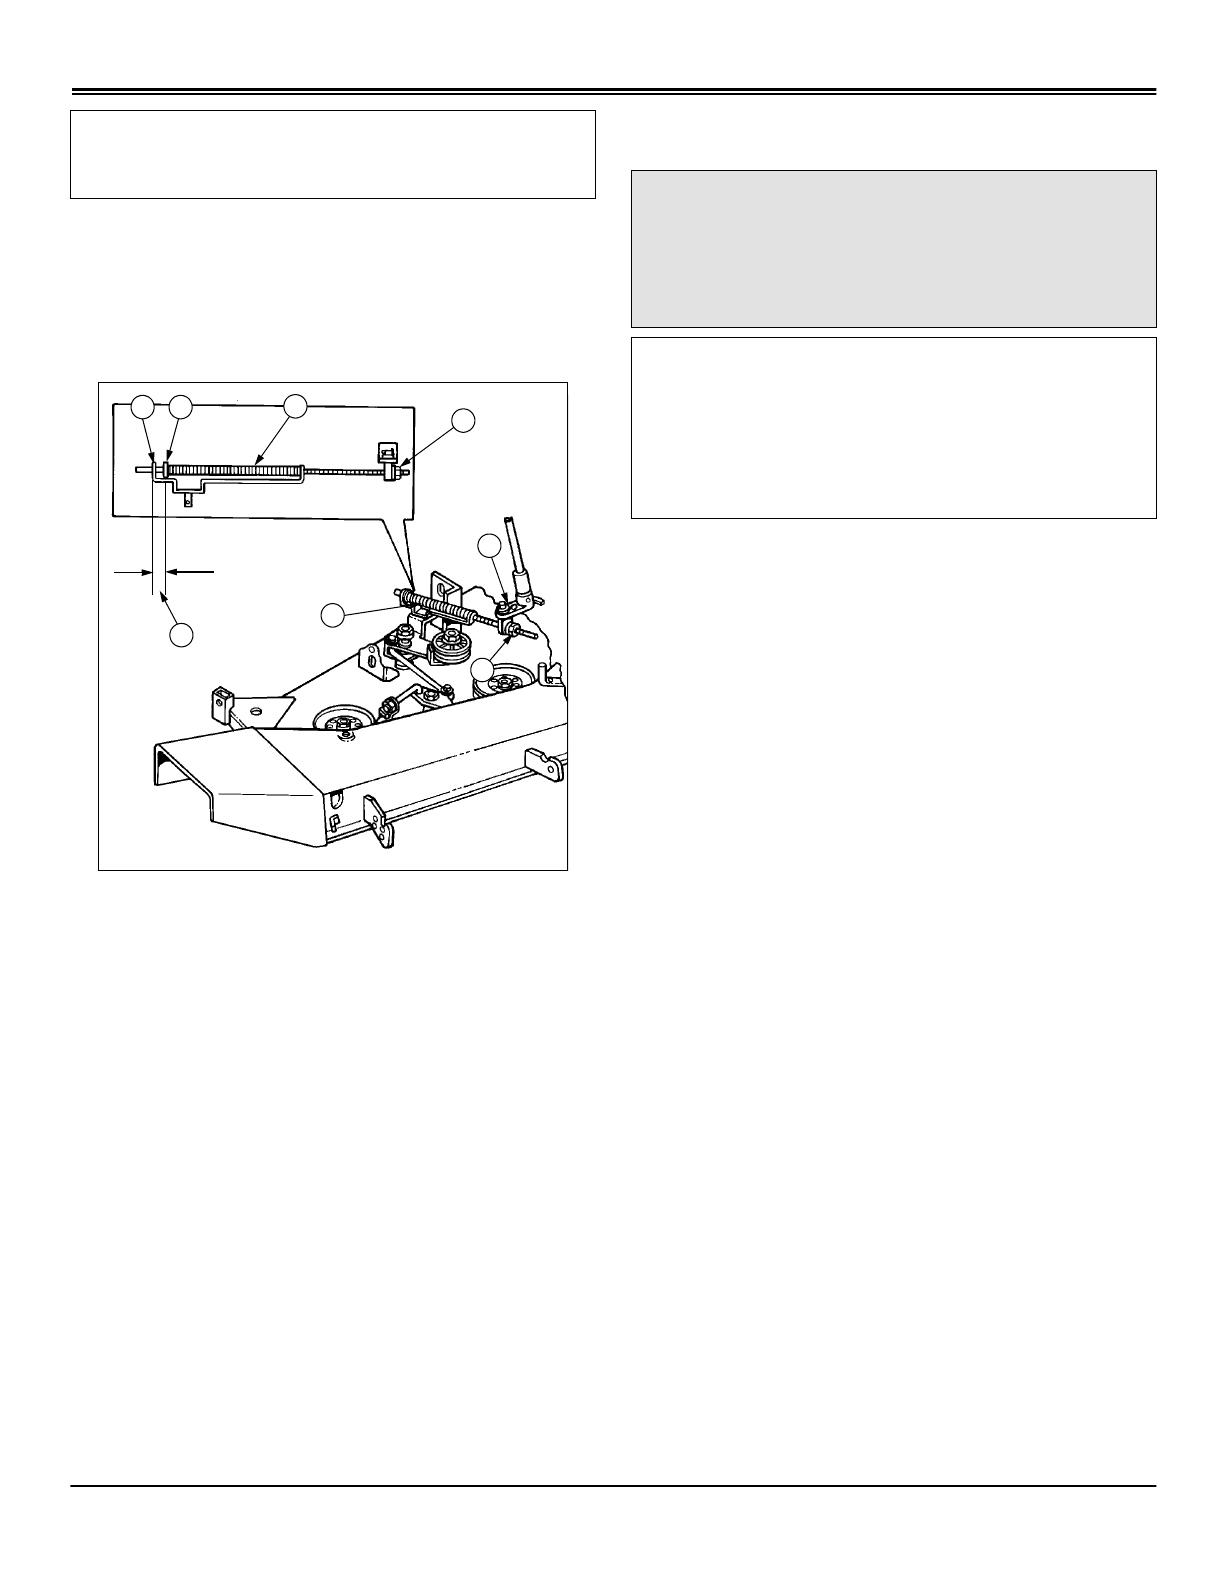 scotts s1642, s1742, s2046 manual c